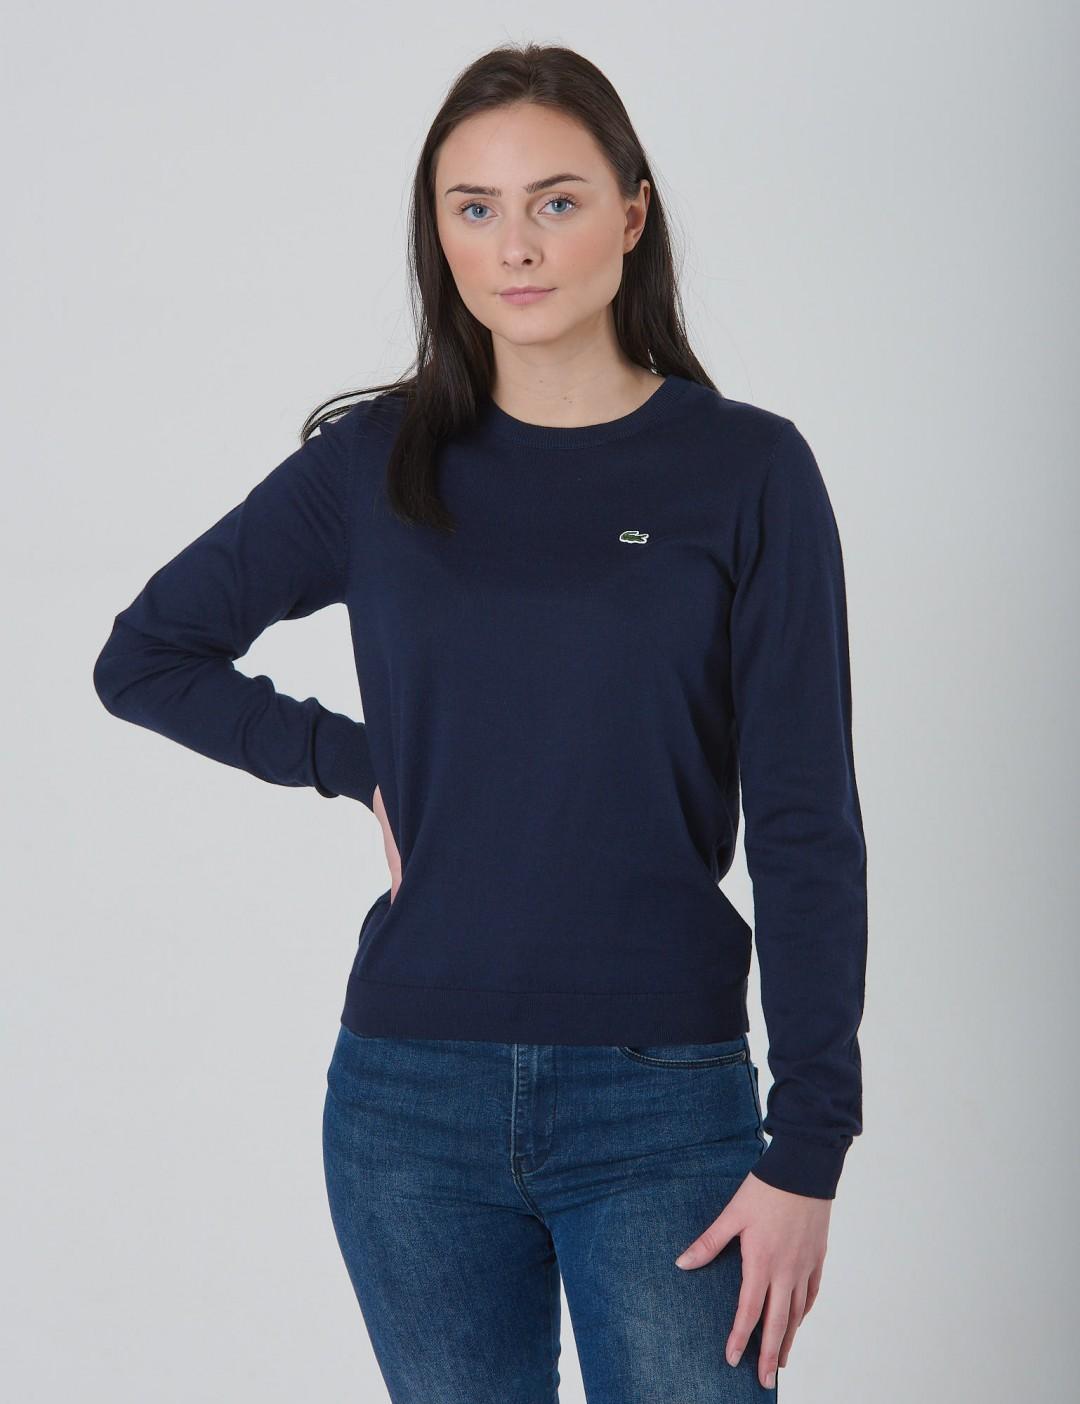 0a403e68295 Om Sweater - Blå från Lacoste   KidsBrandStore